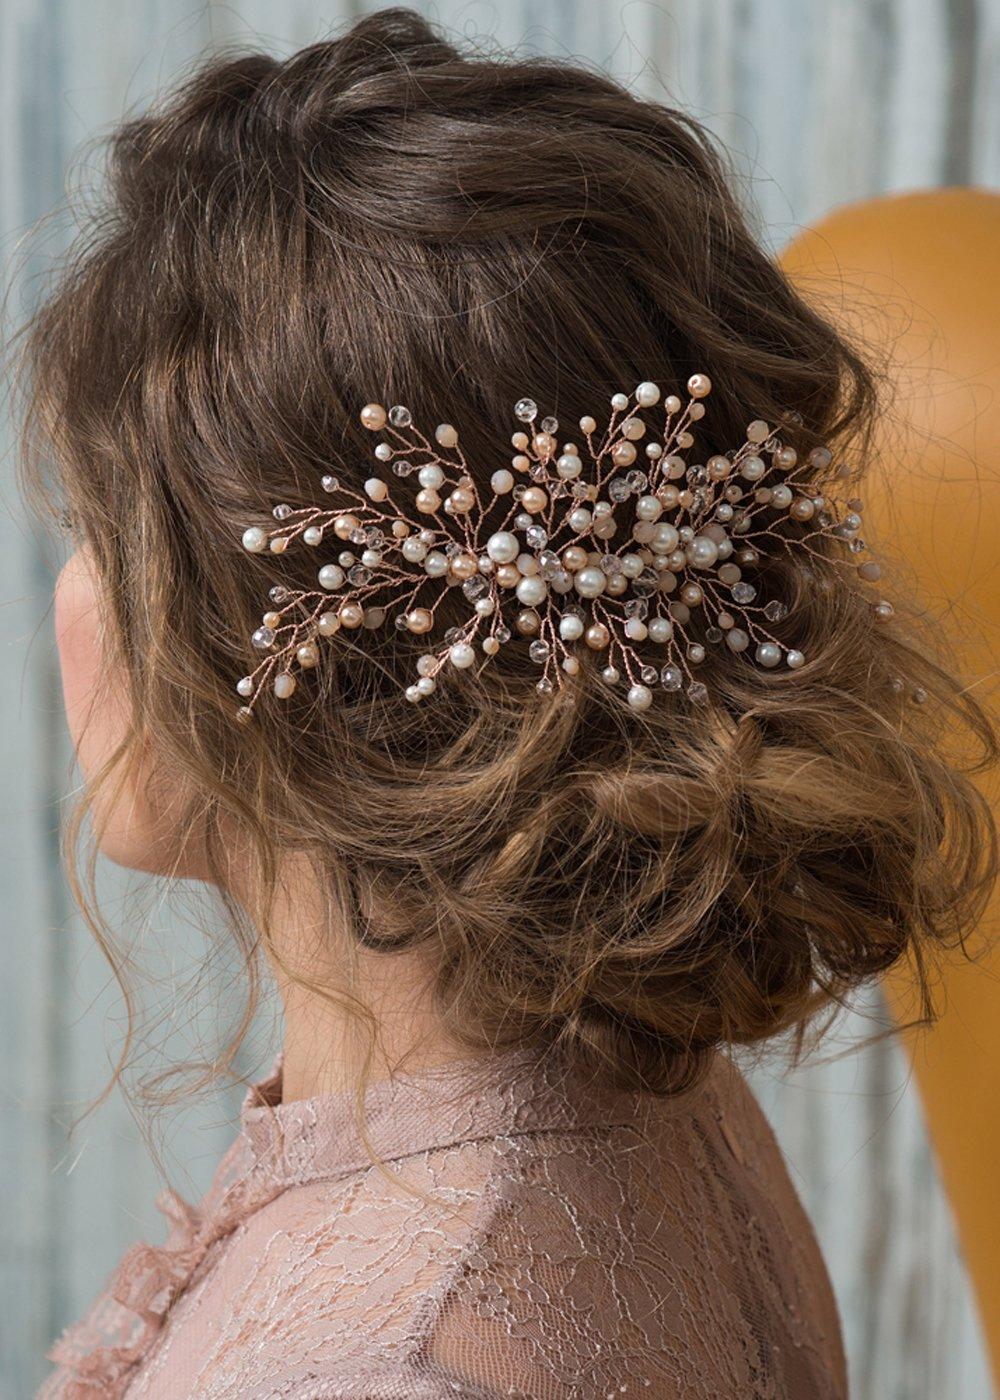 Kercisbeauty Wedding Bridal Bridesmaids Flower Girl Pink Champagne Rose Gold Beads Combs Headband Bridal Hair Comb Headpiece Long Curly Bun Hair Accessories,Wedding Hair Piece Vintage Hair Comb